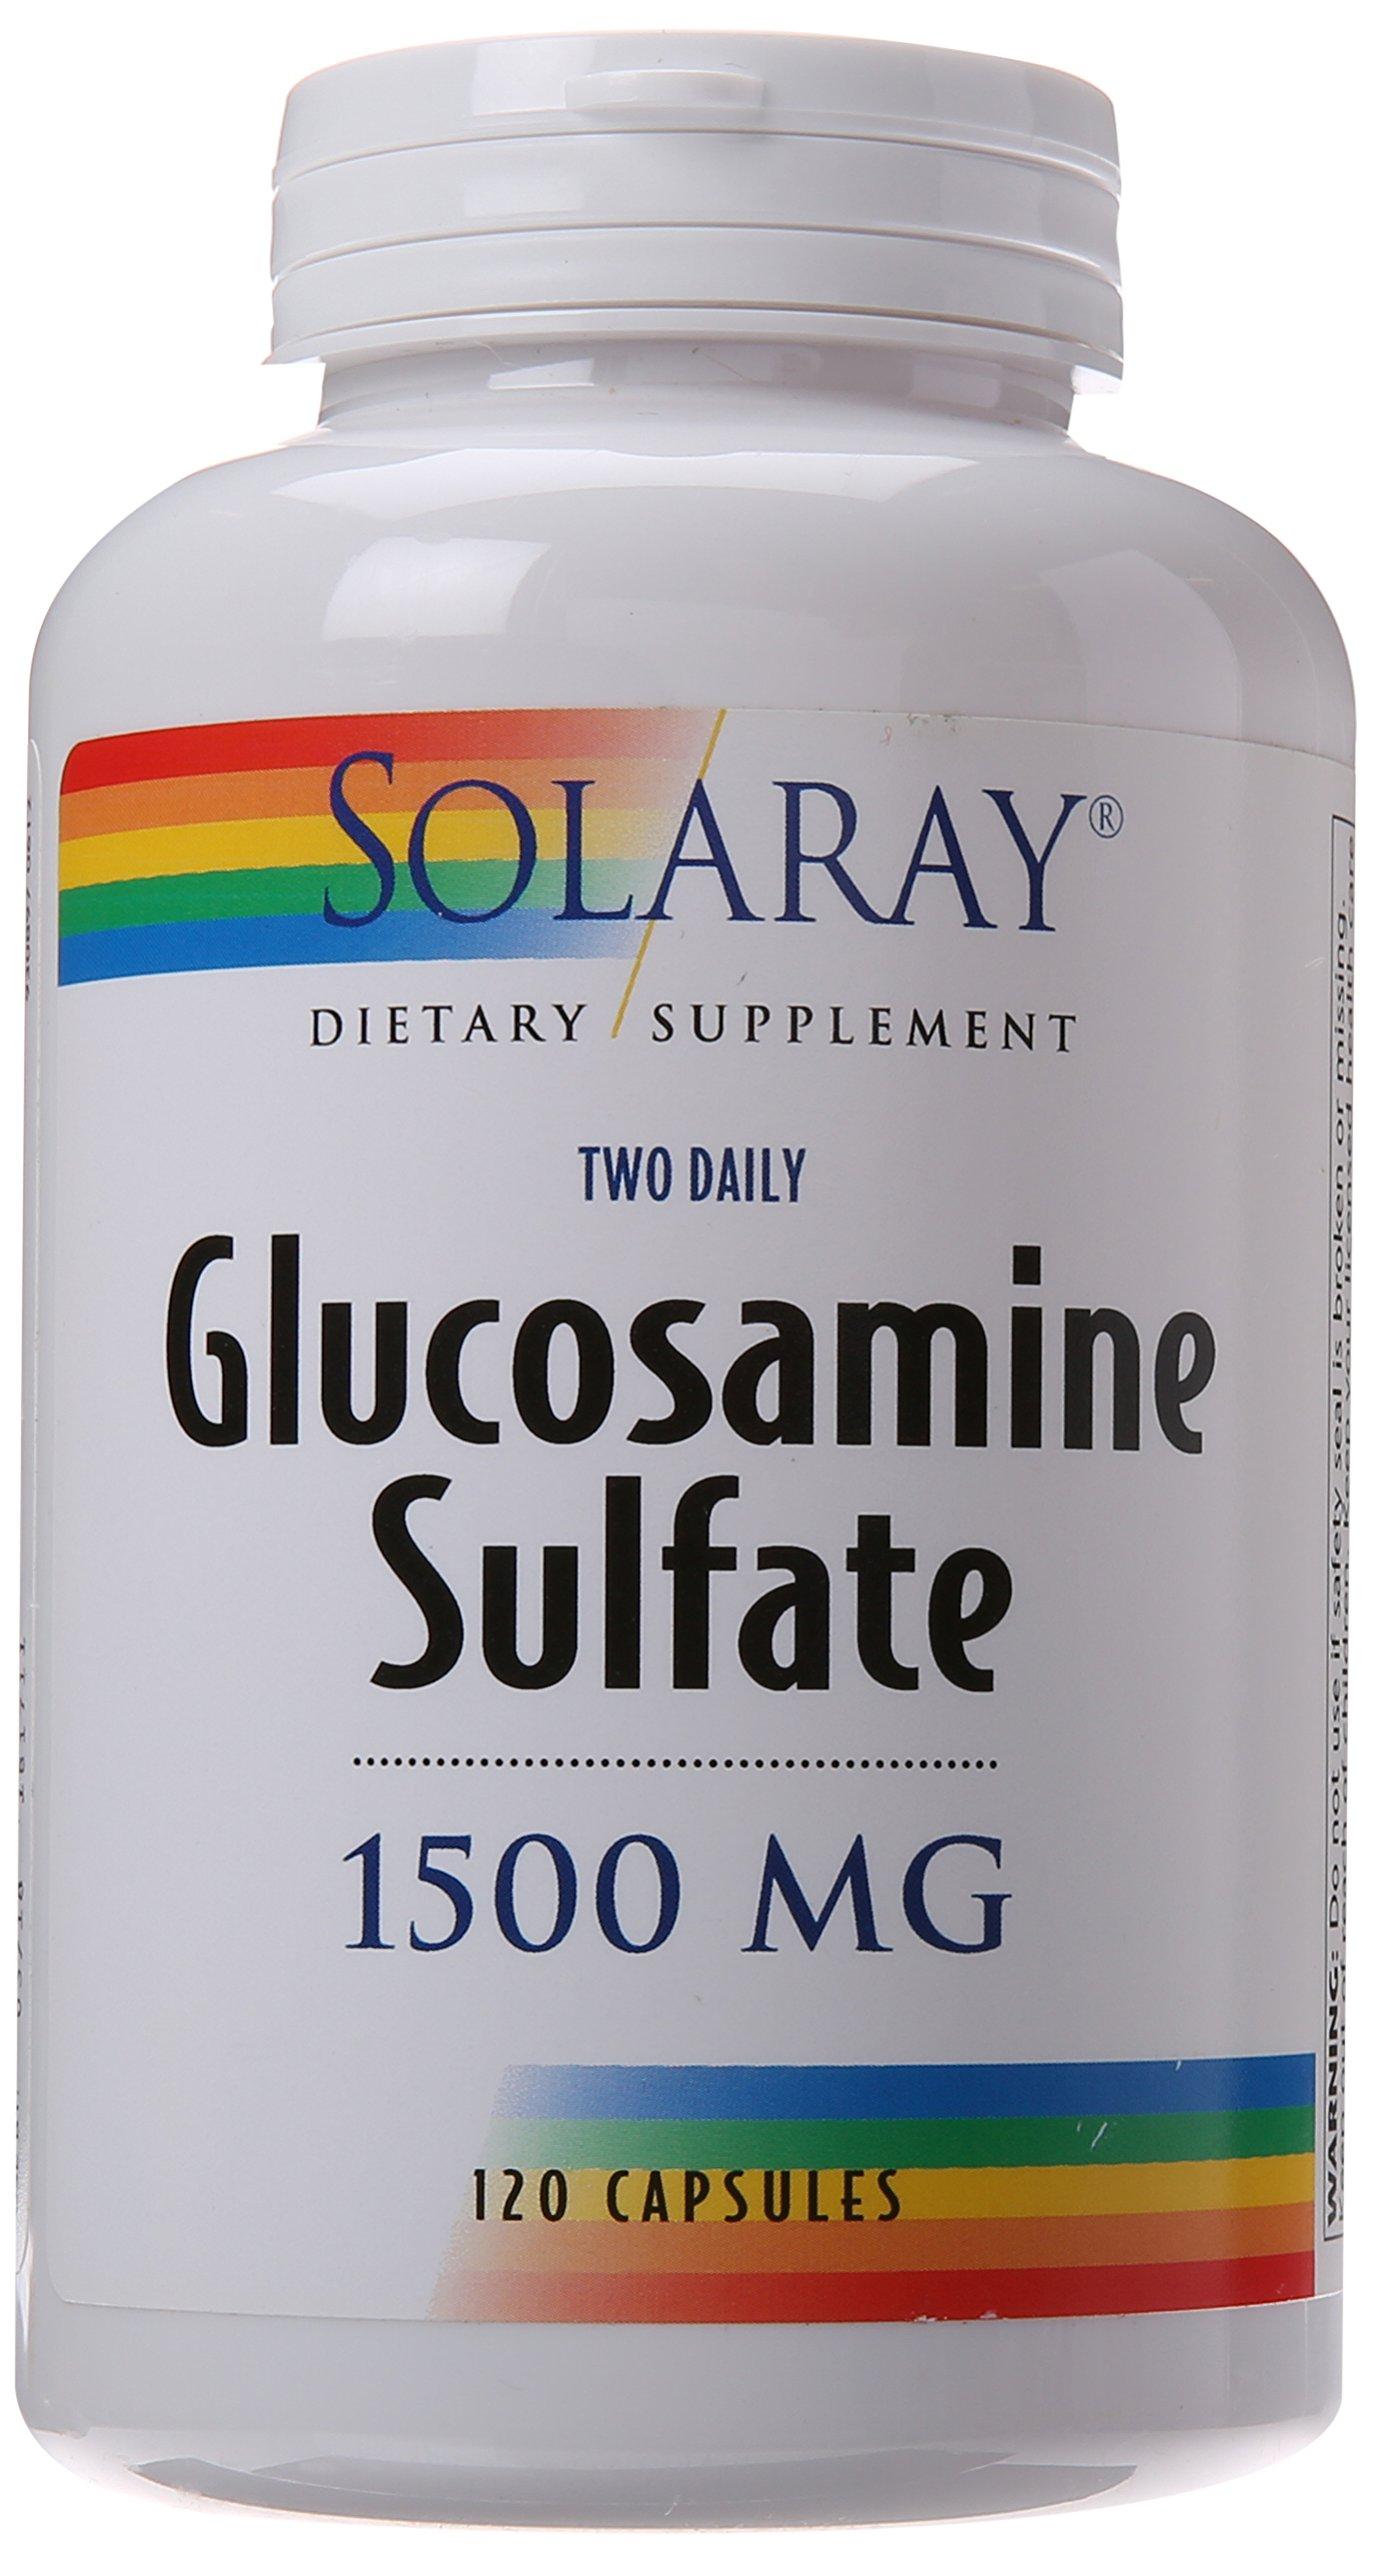 Solaray Glucosamine Sulfate Capsules, 1500mg, 120 Count